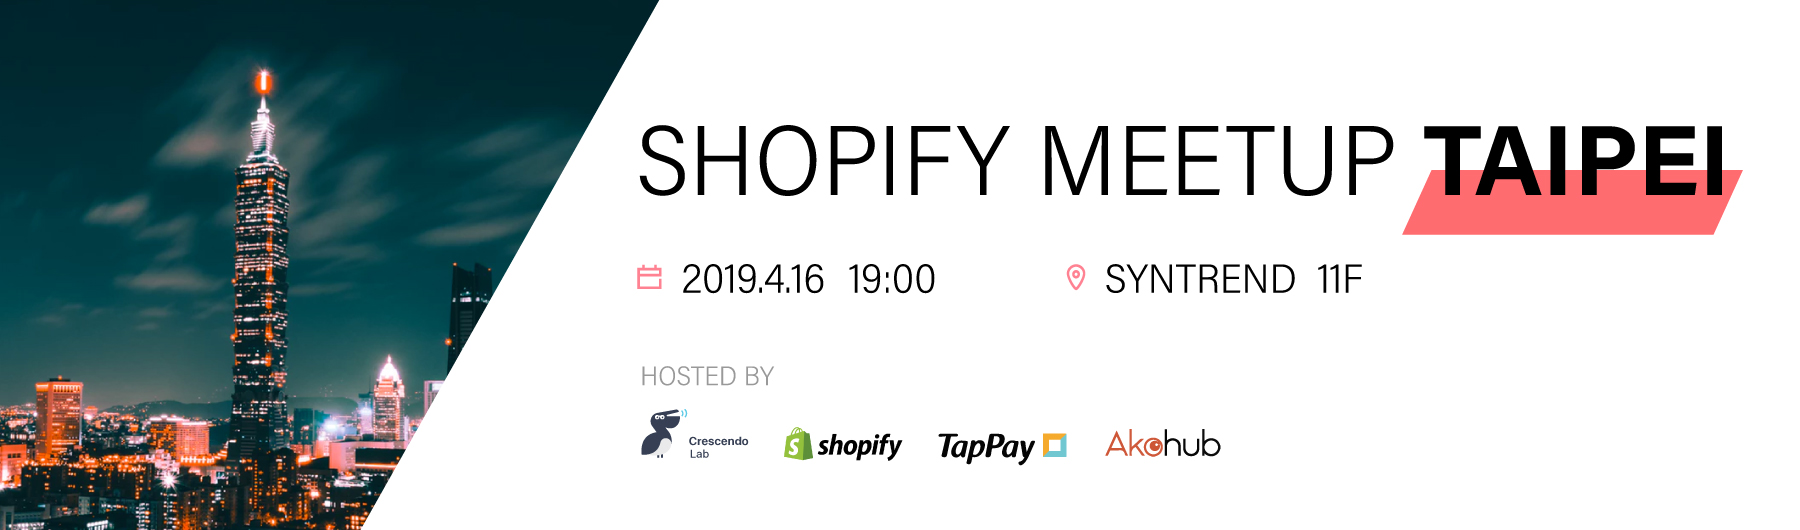 Shopify Meetup Taiwan - 台北 meetup